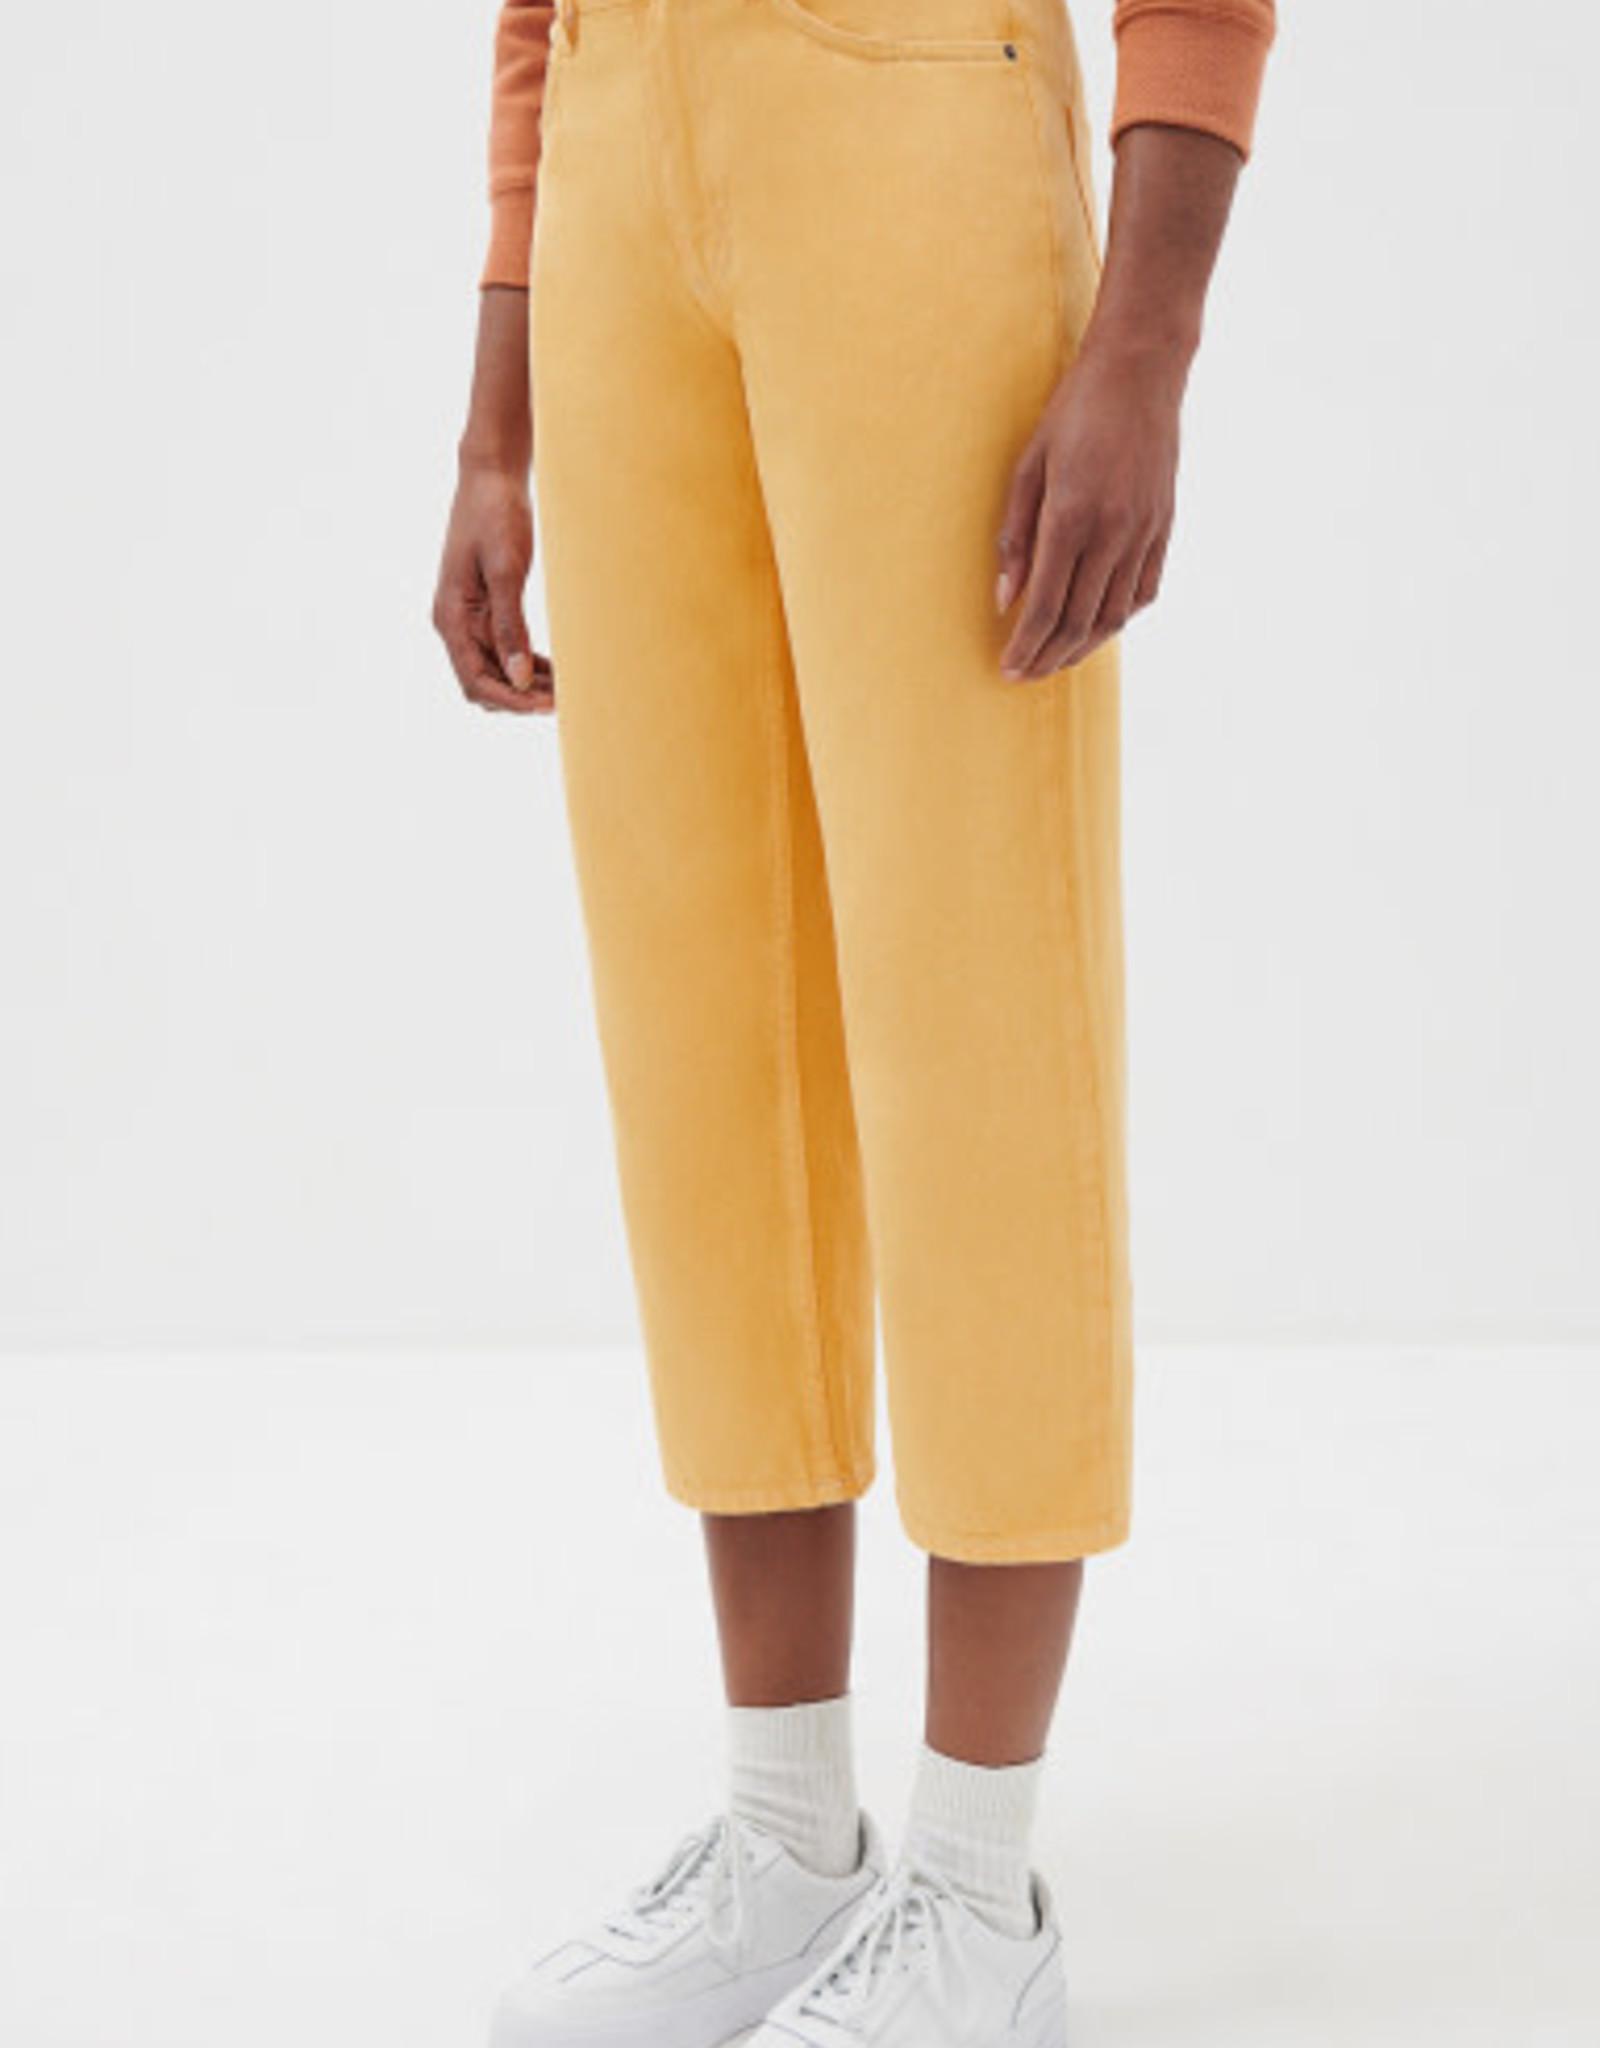 American Vintage Jeans 'Tineborow' Straight - Sunset Vintage - American Vintage